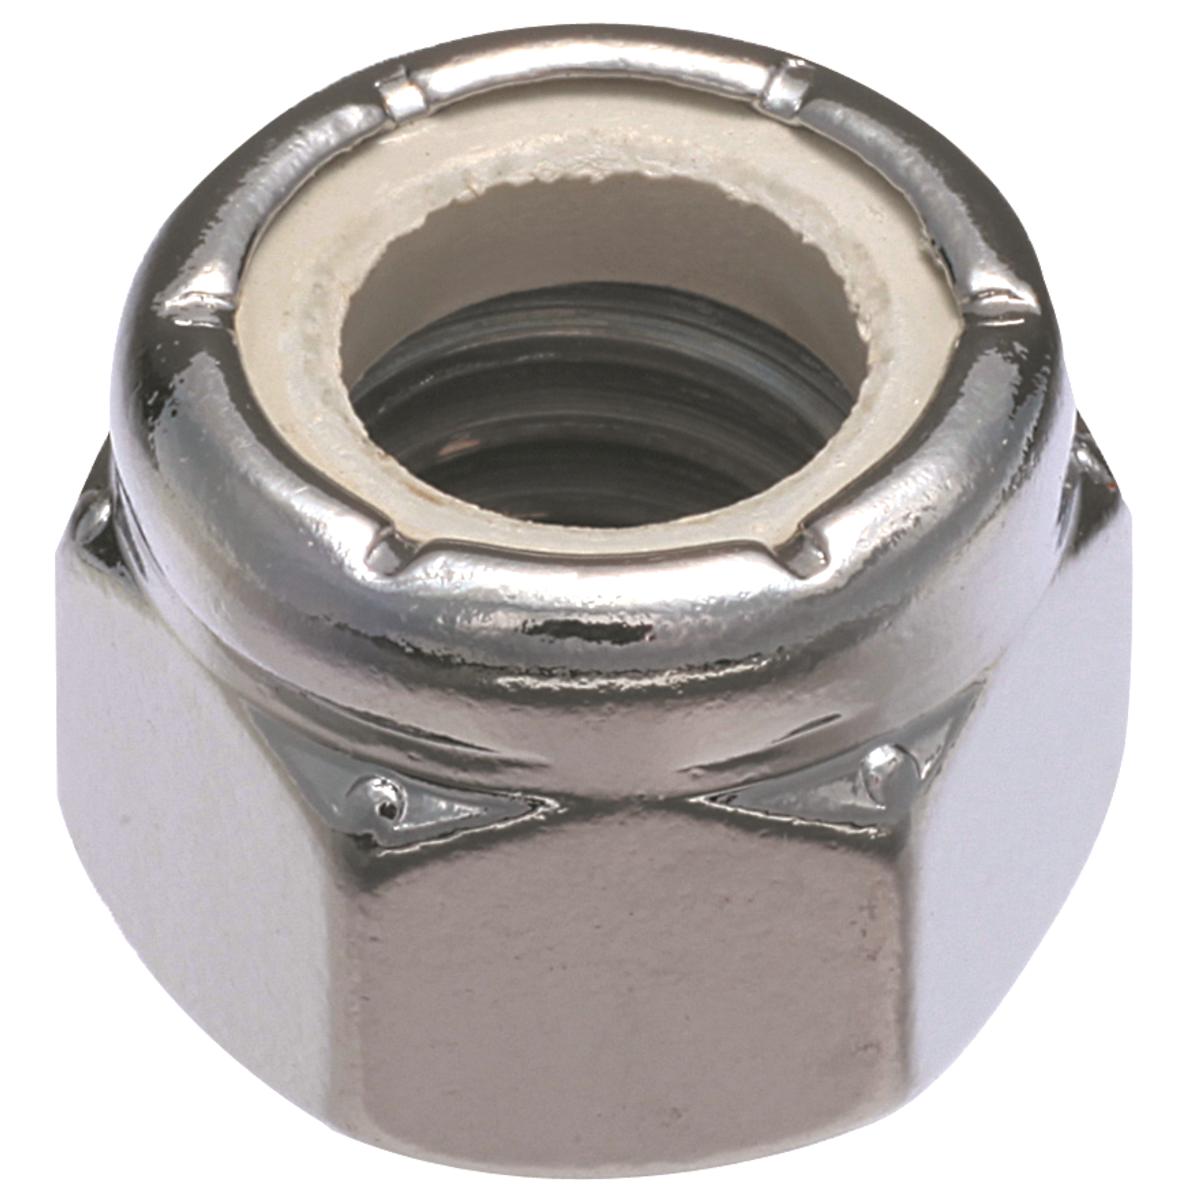 #2-56 Nylon Insert Lock Nuts — 18-8 Stainless Steel, Coarse, 100/PKG